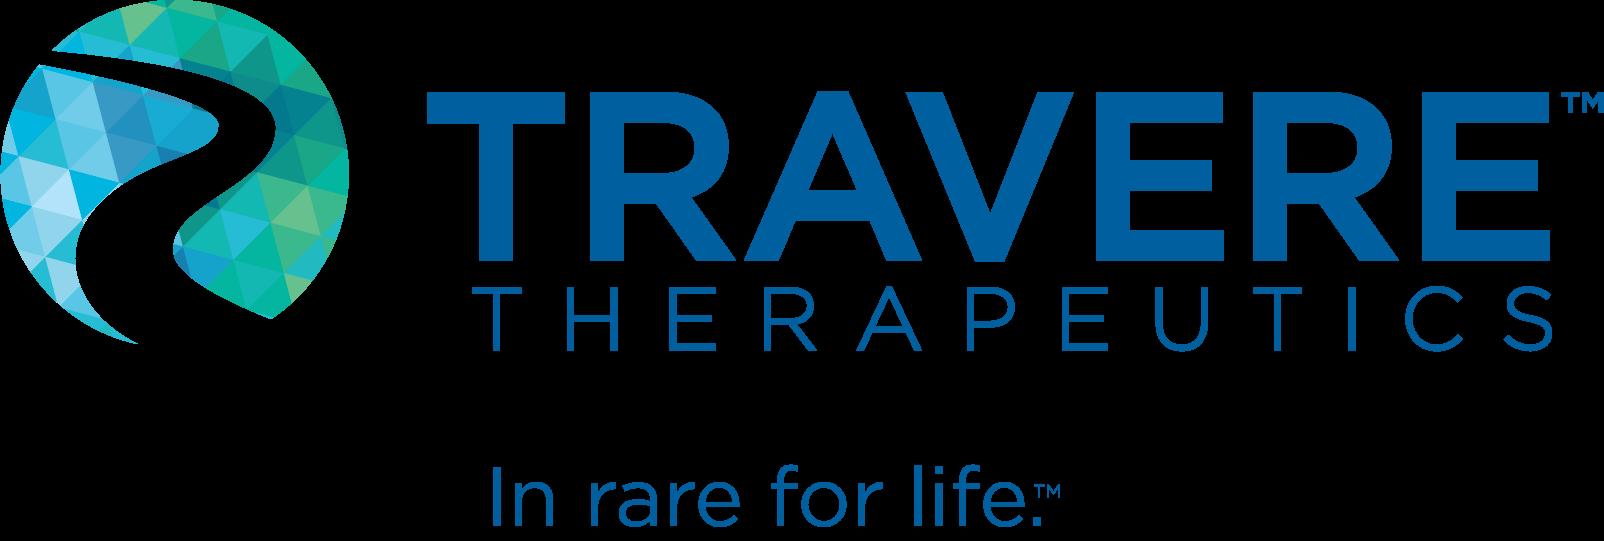 Travere-TxTM-Inline-fullcolor-tagline-1